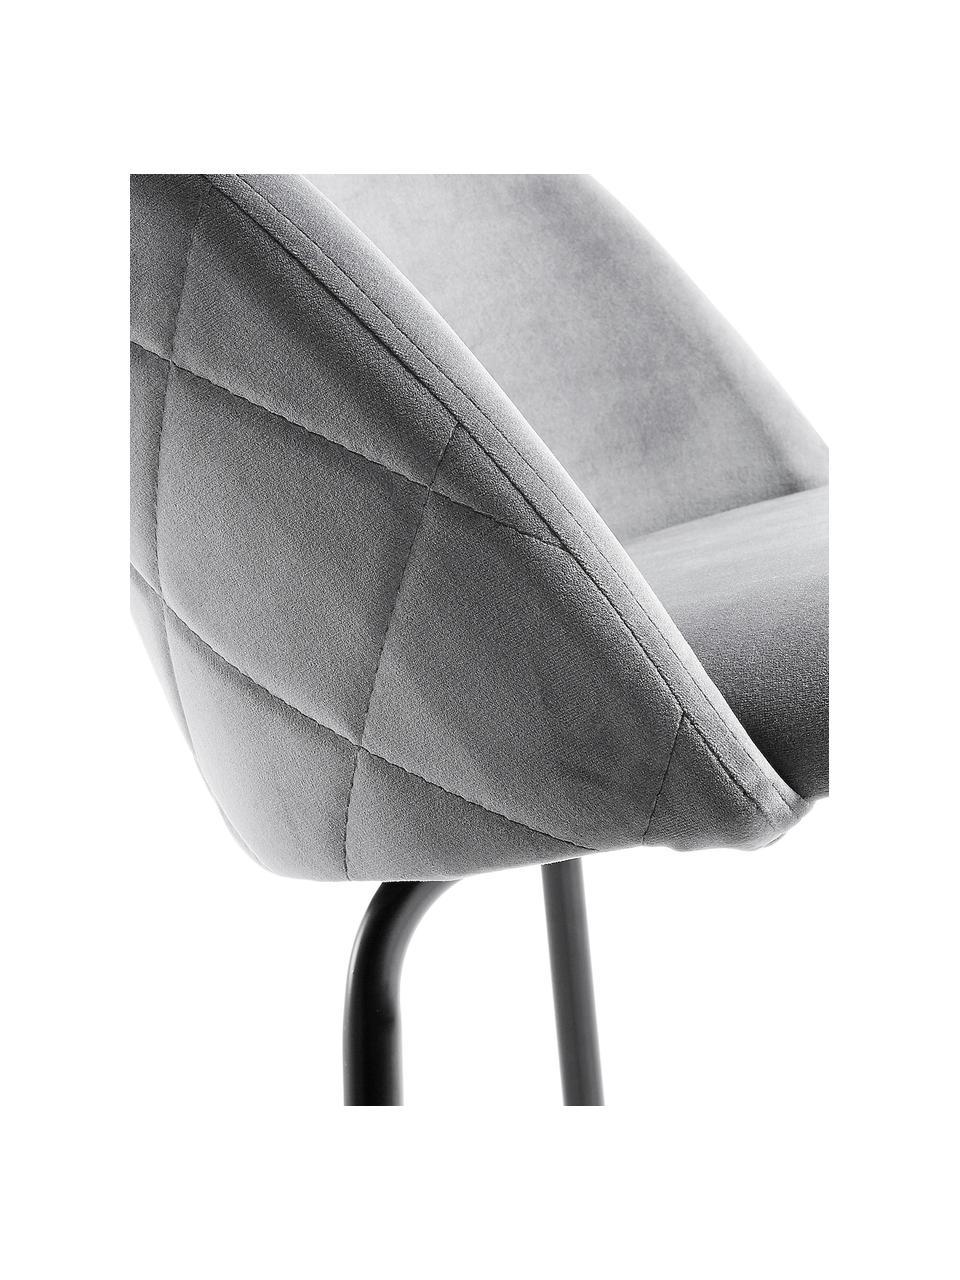 Samt-Barhocker Ivonne, Bezug: Polyestersamt, Gestell: Metall, lackiert, Grau, Schwarz, 53 x 108 cm